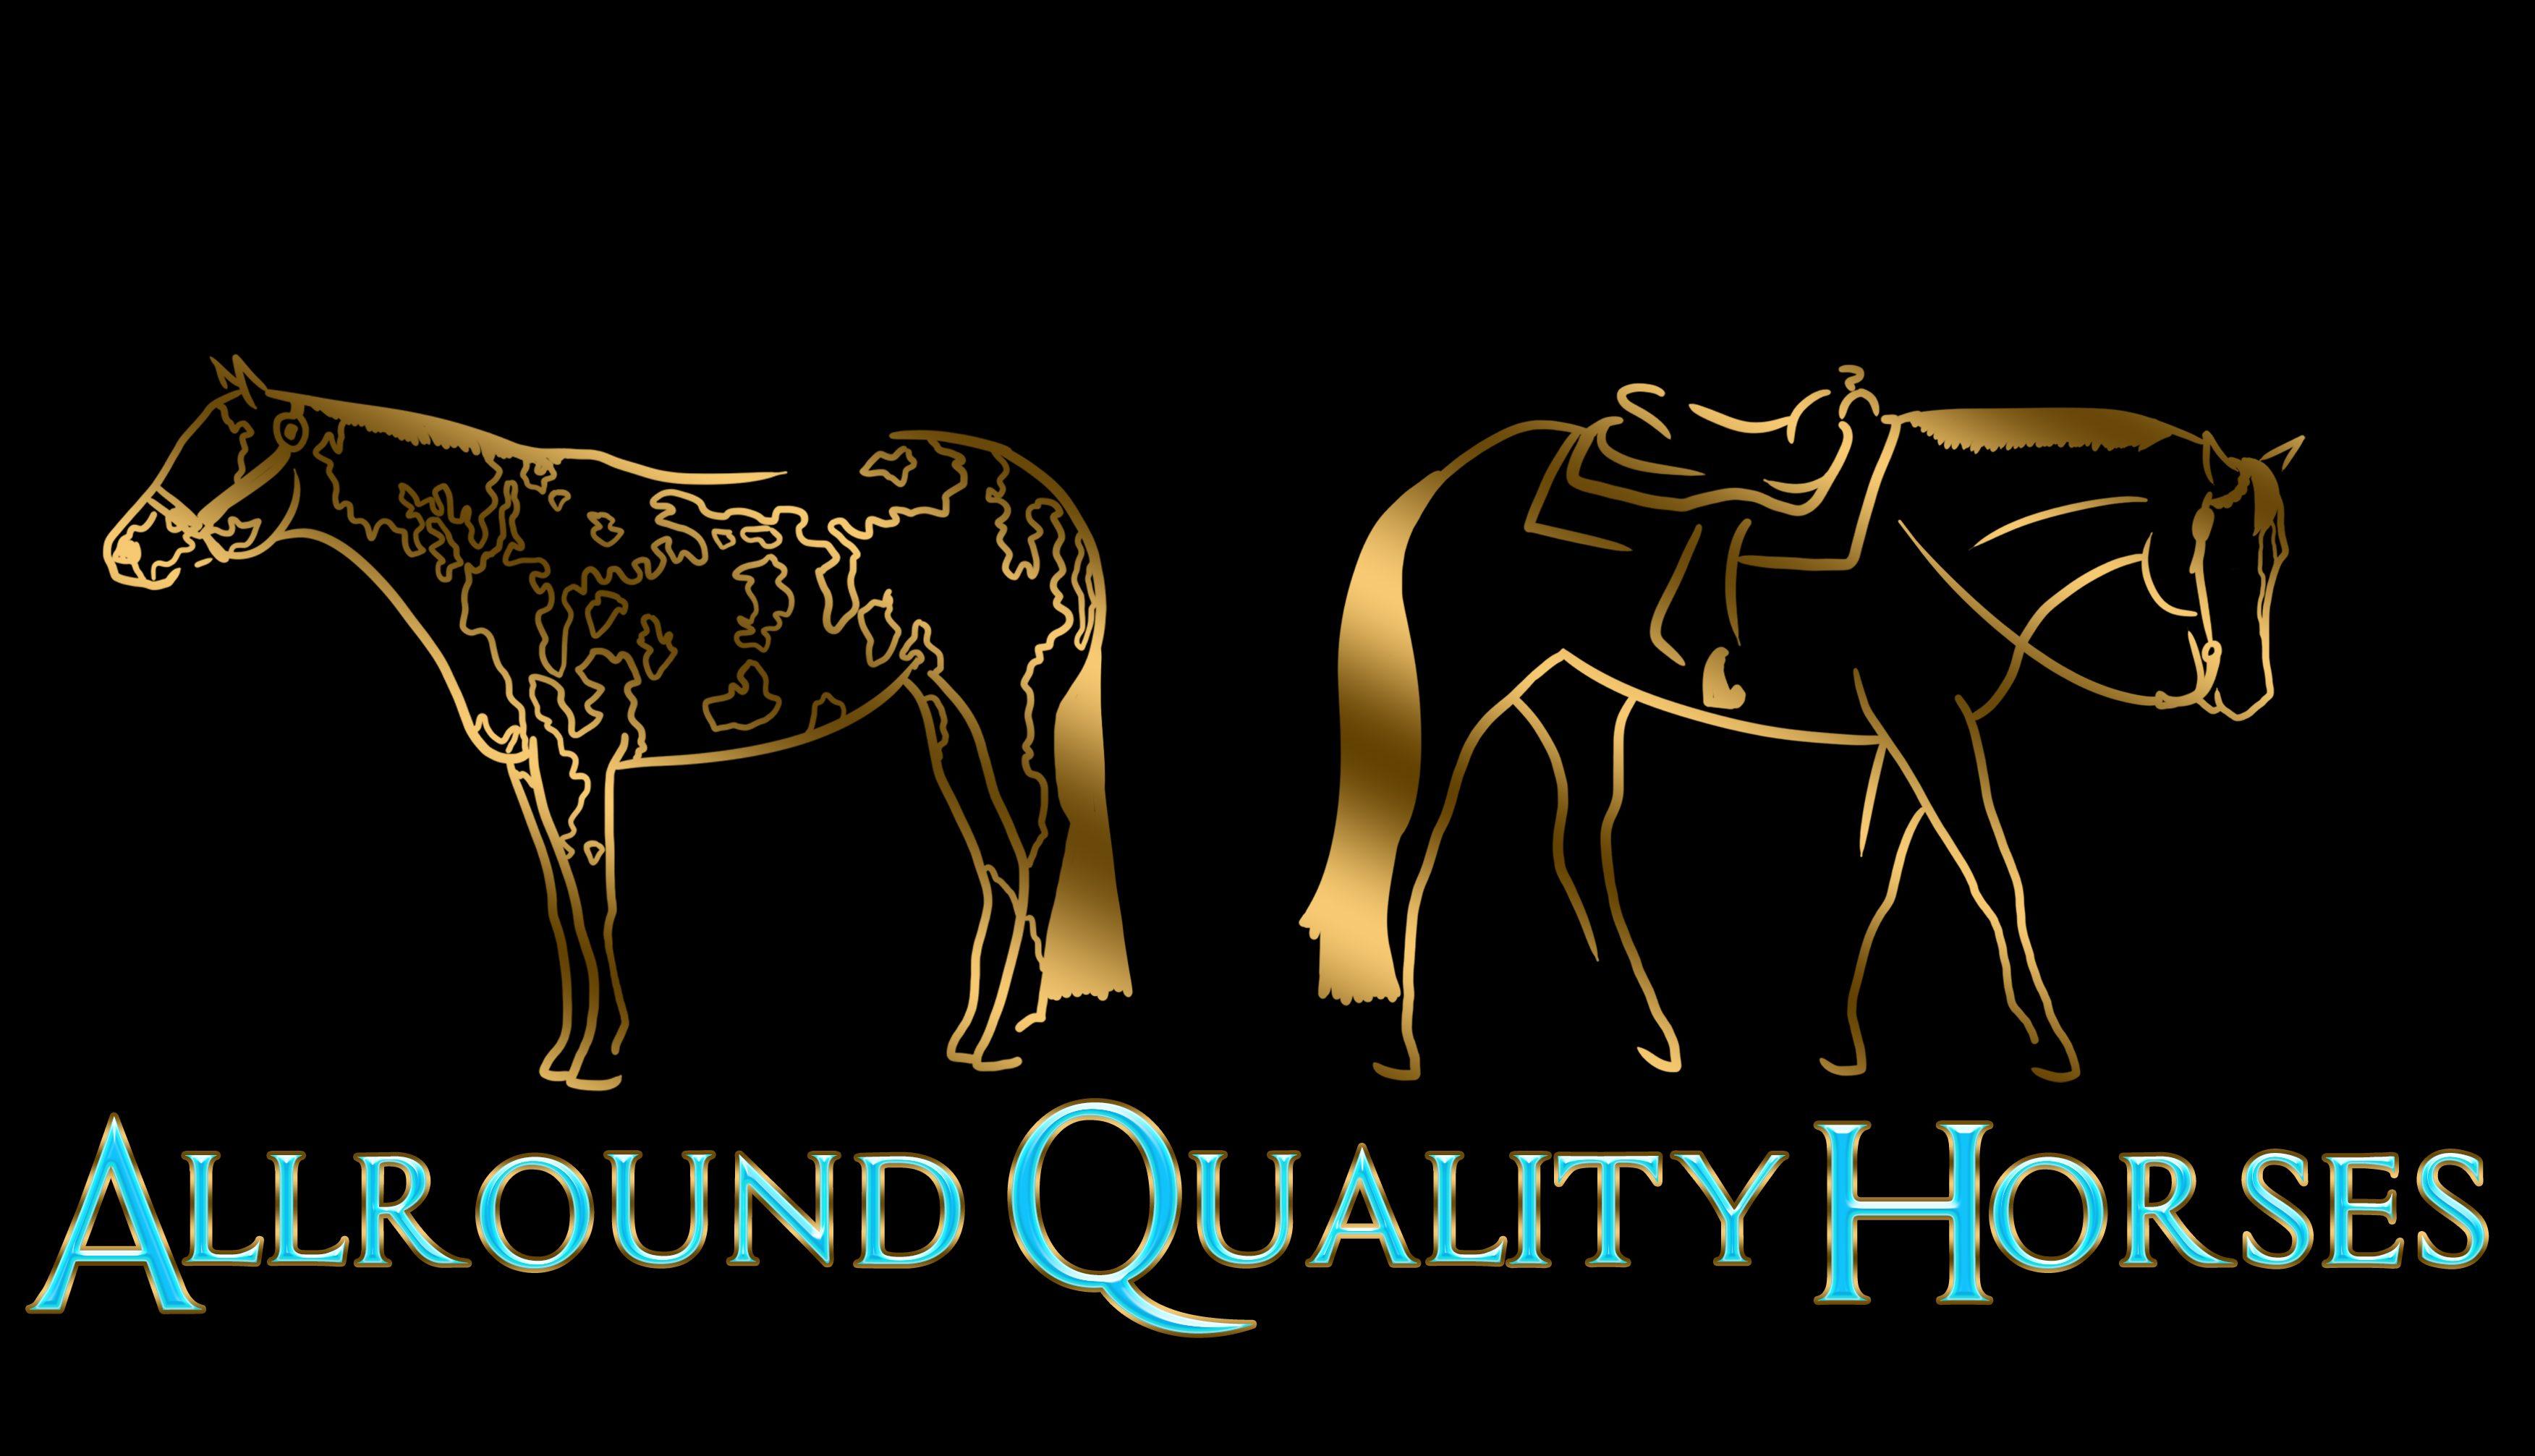 Allround Quality Horses